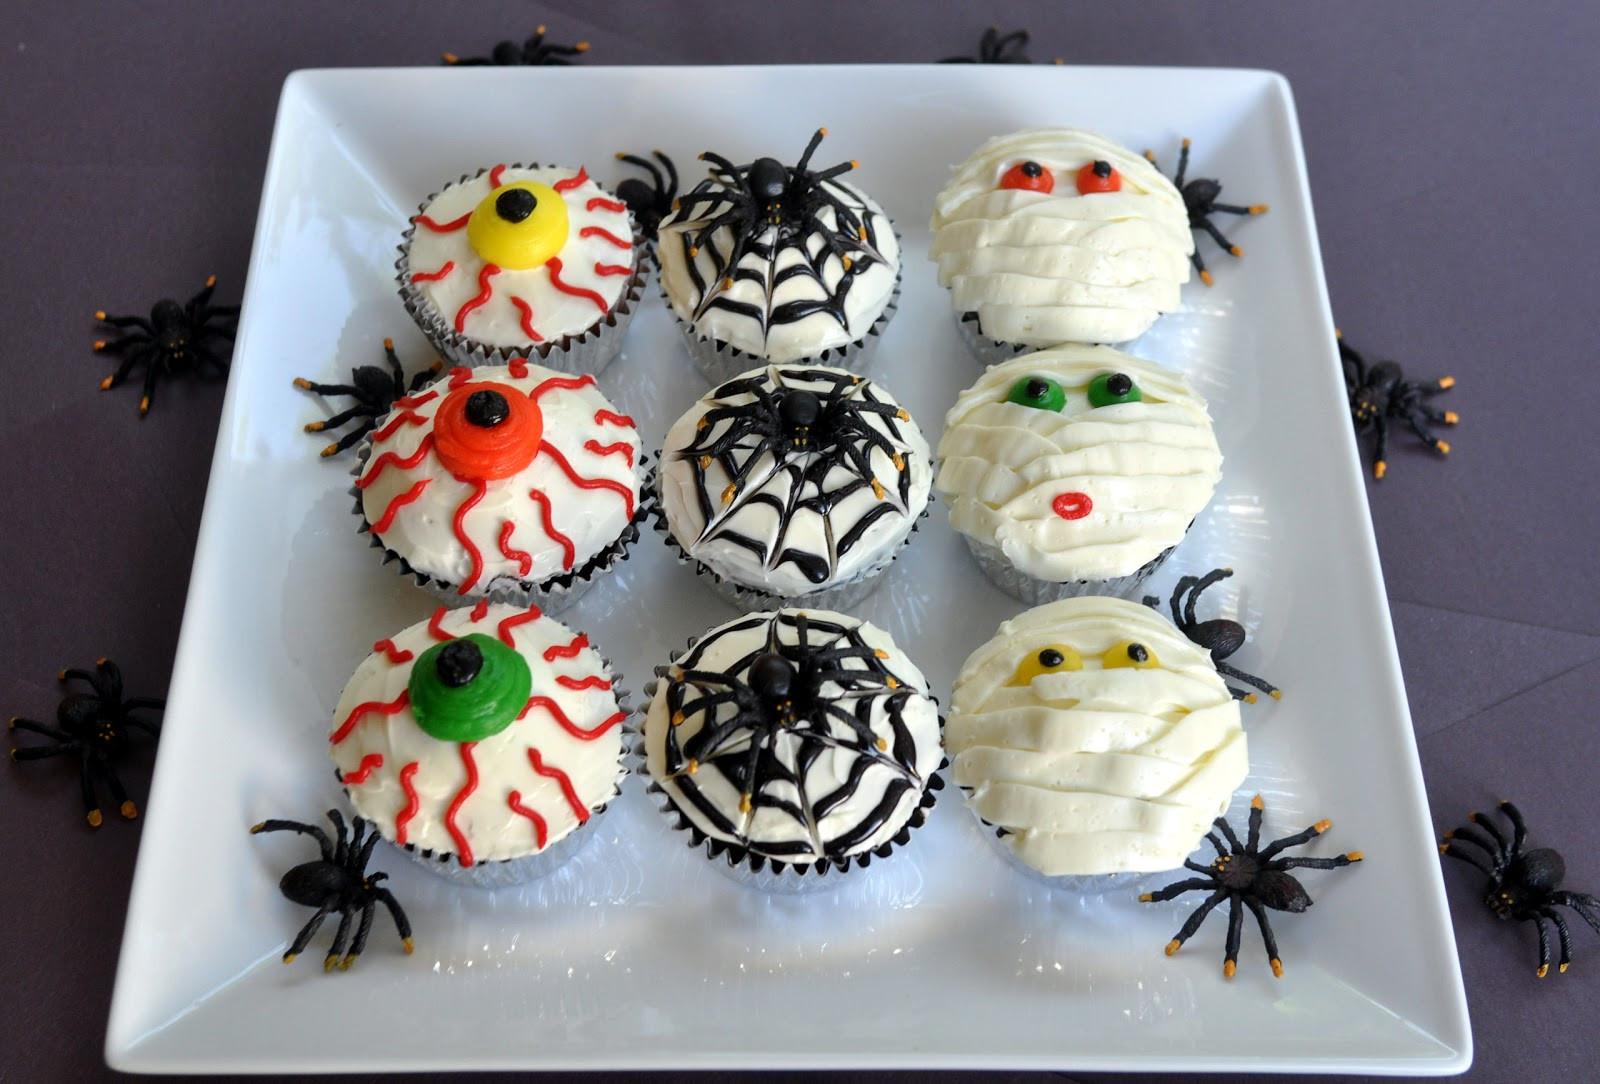 Creepy Halloween Cupcakes  Beki Cook s Cake Blog Halloween Party Treats